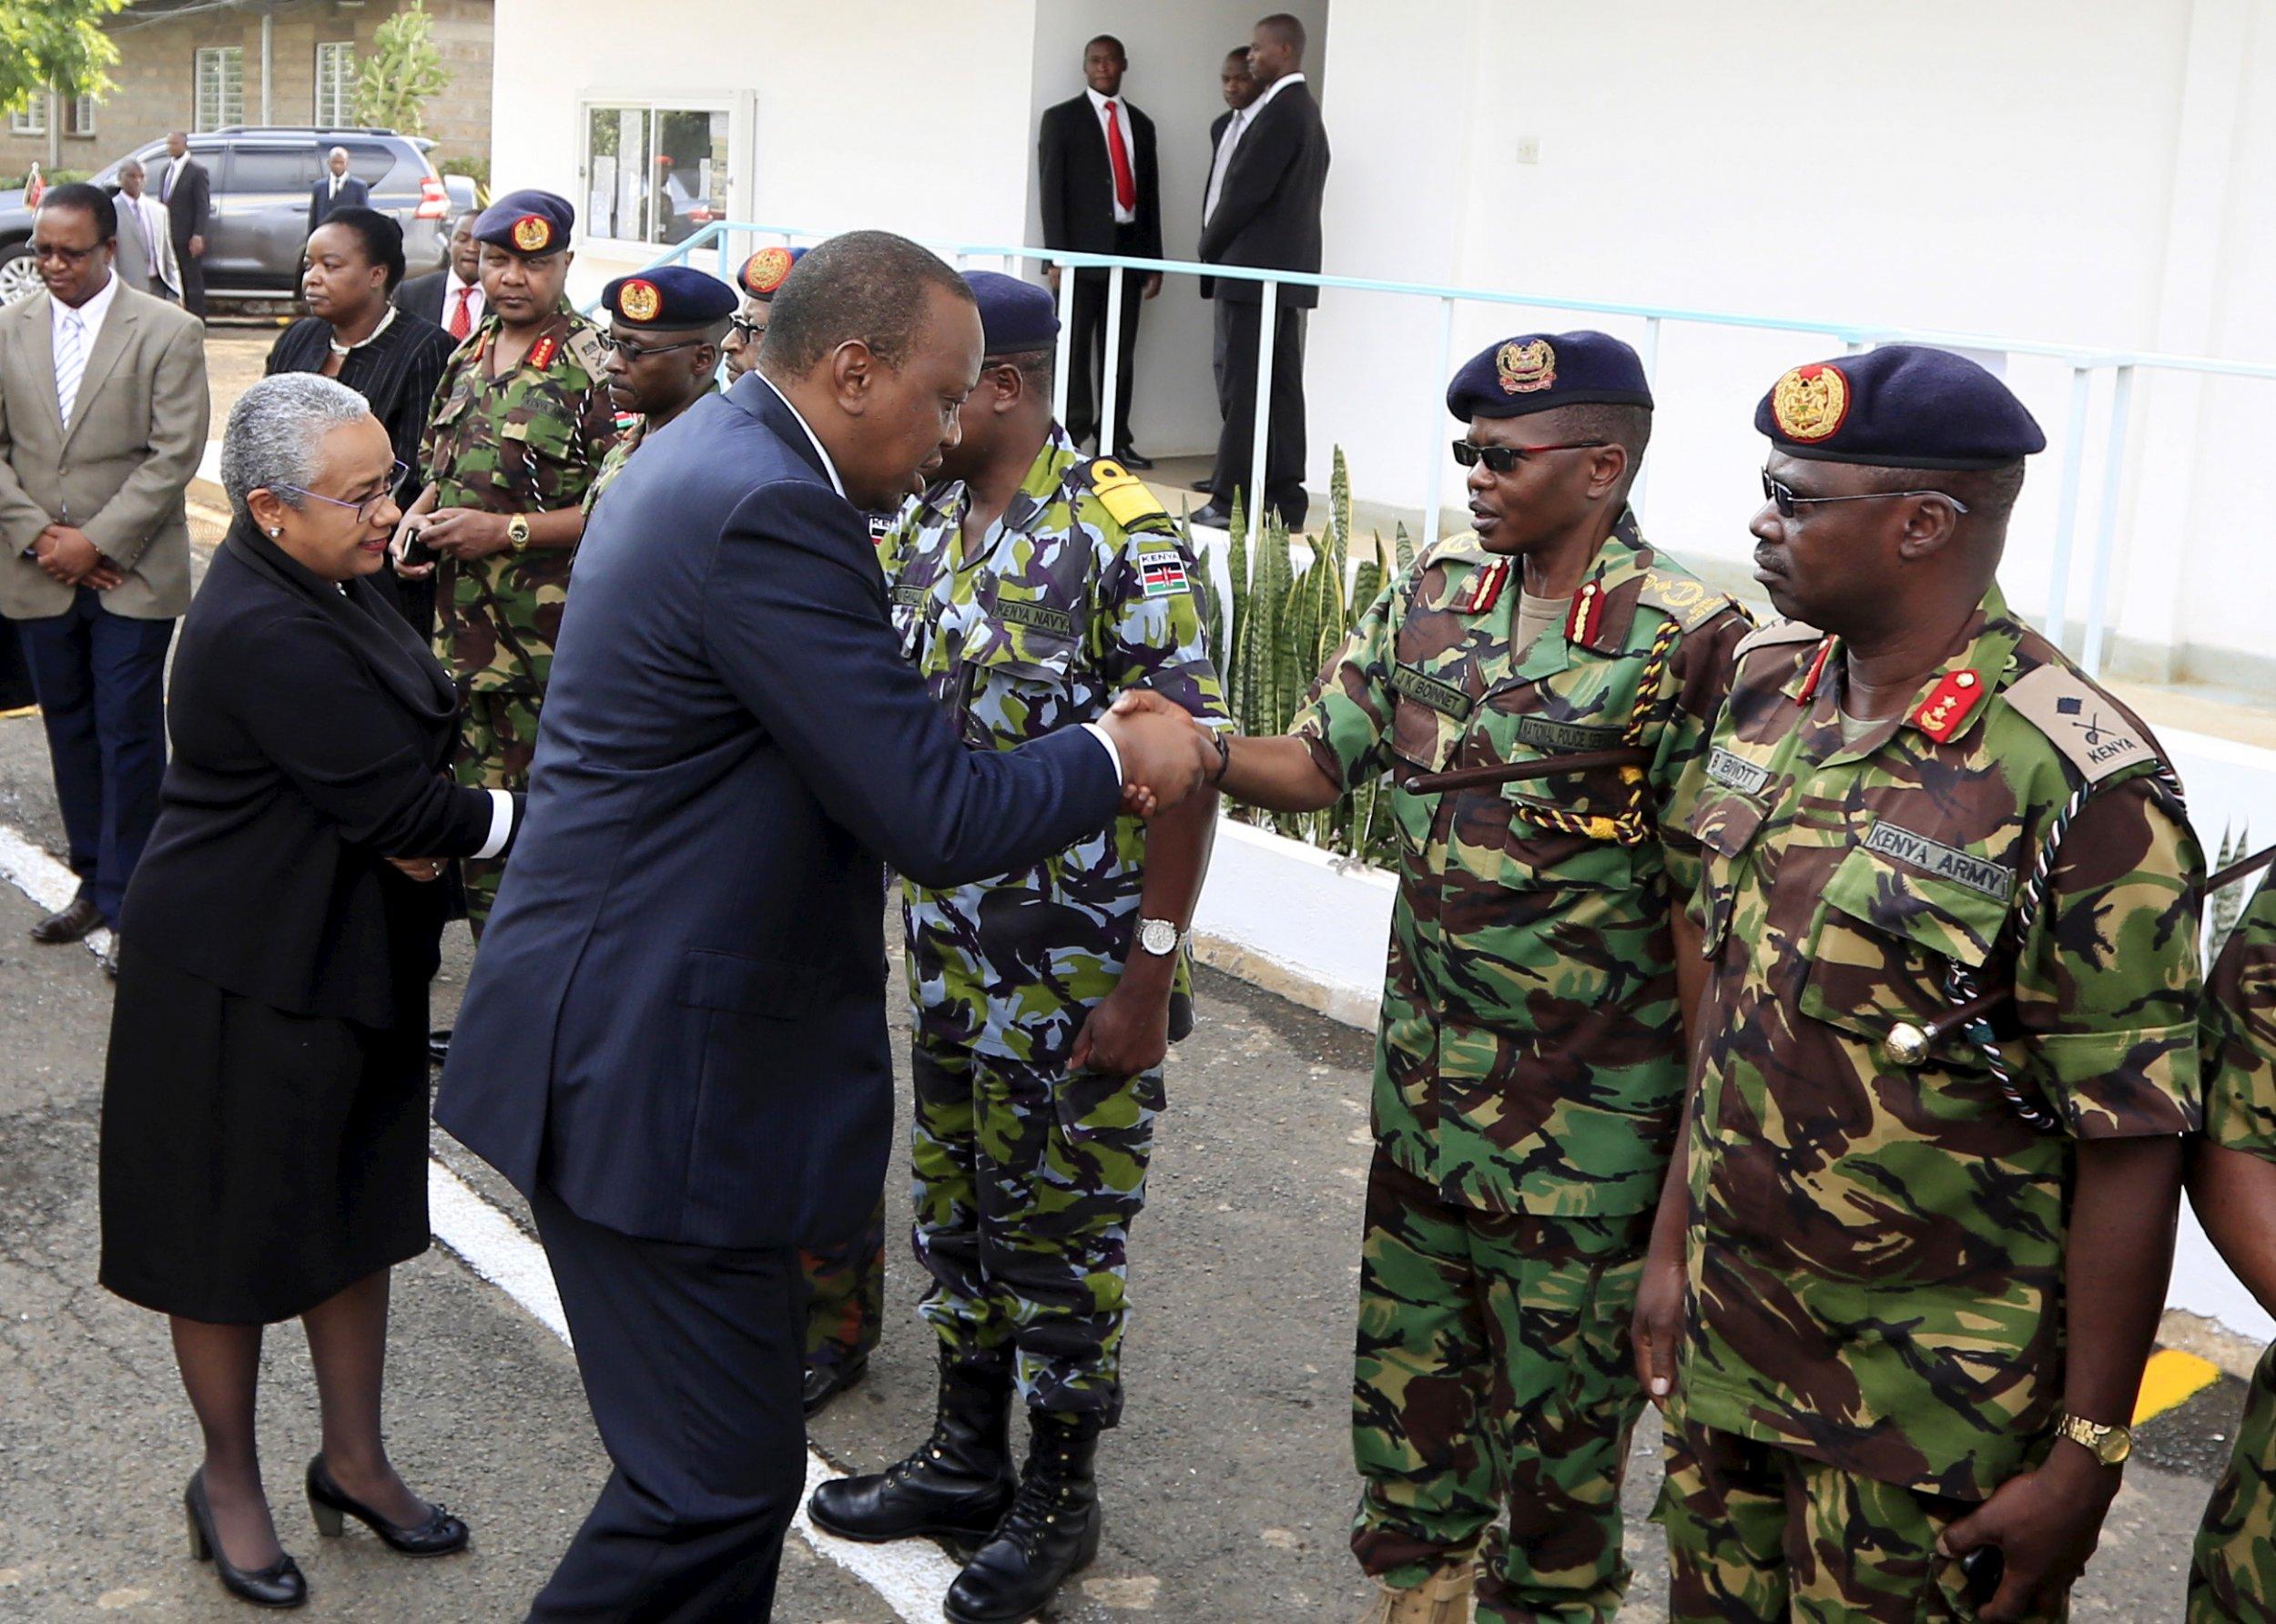 Uhuru Kenyatta greets military officers after Al-Shabab attack.